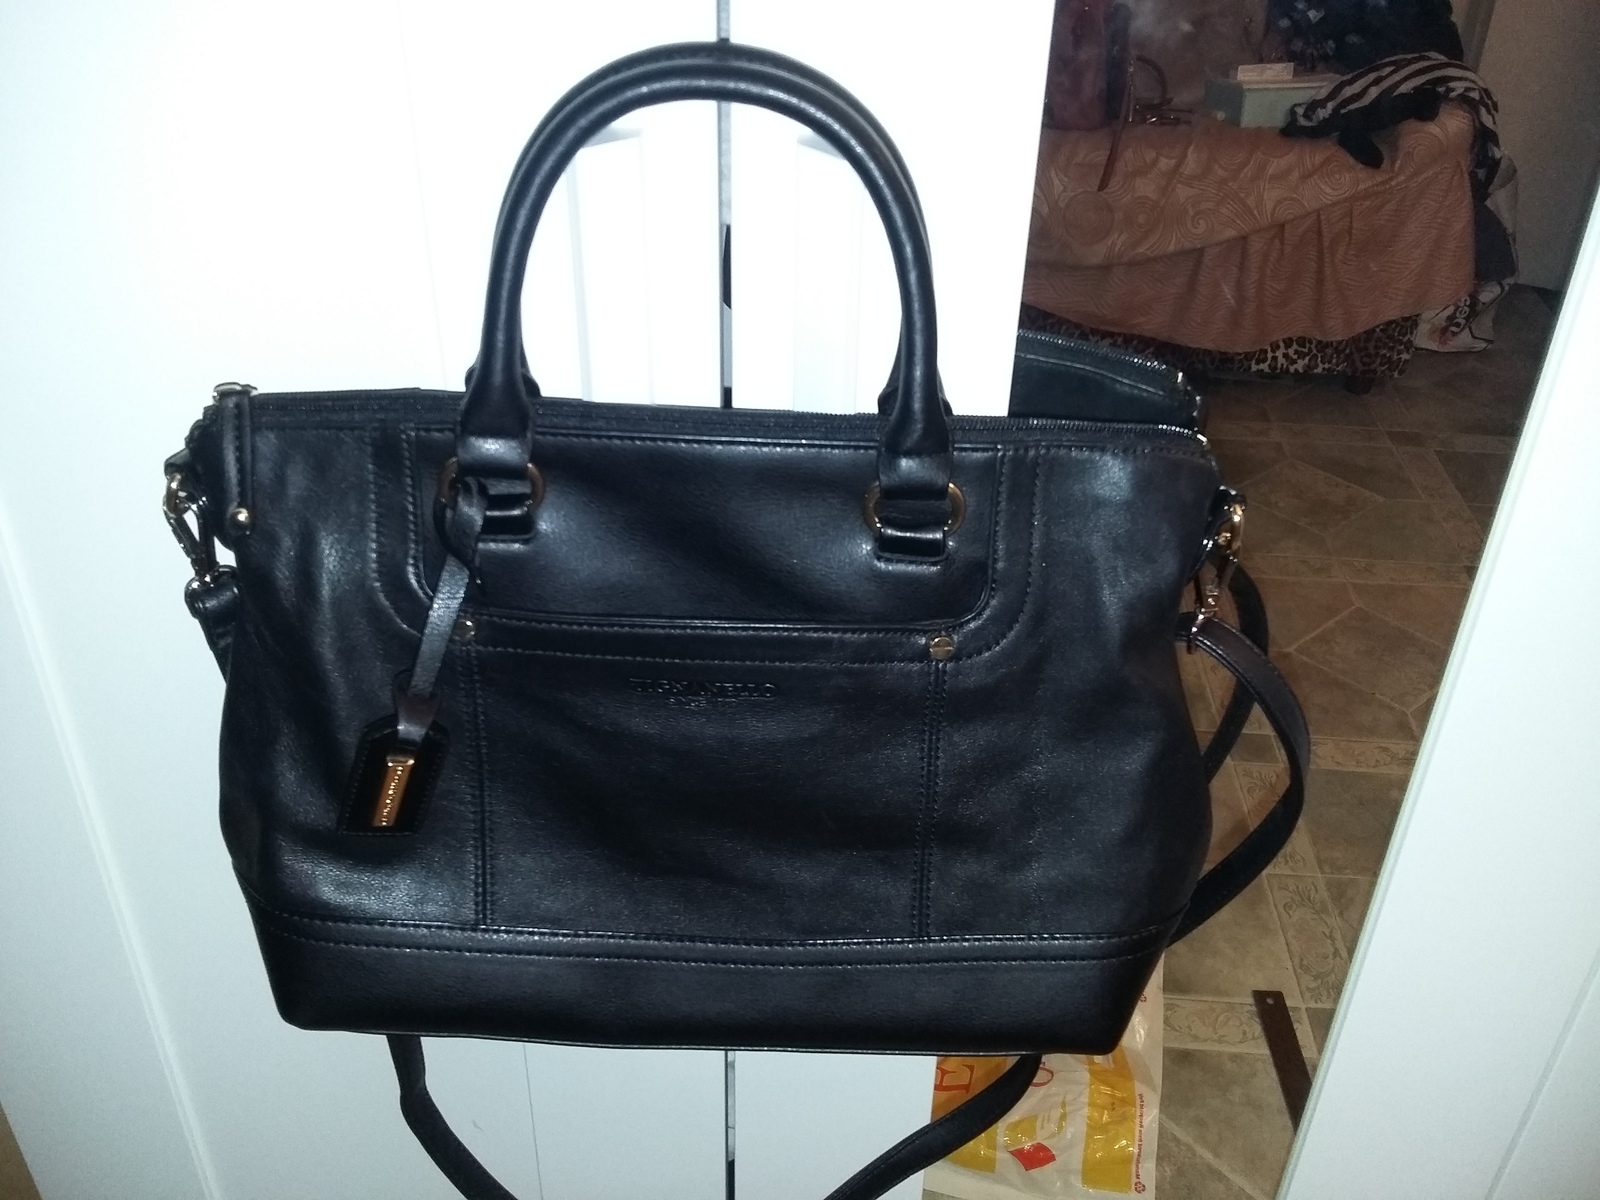 Tignanello Handbag 1 Customer Review And 29 Listings